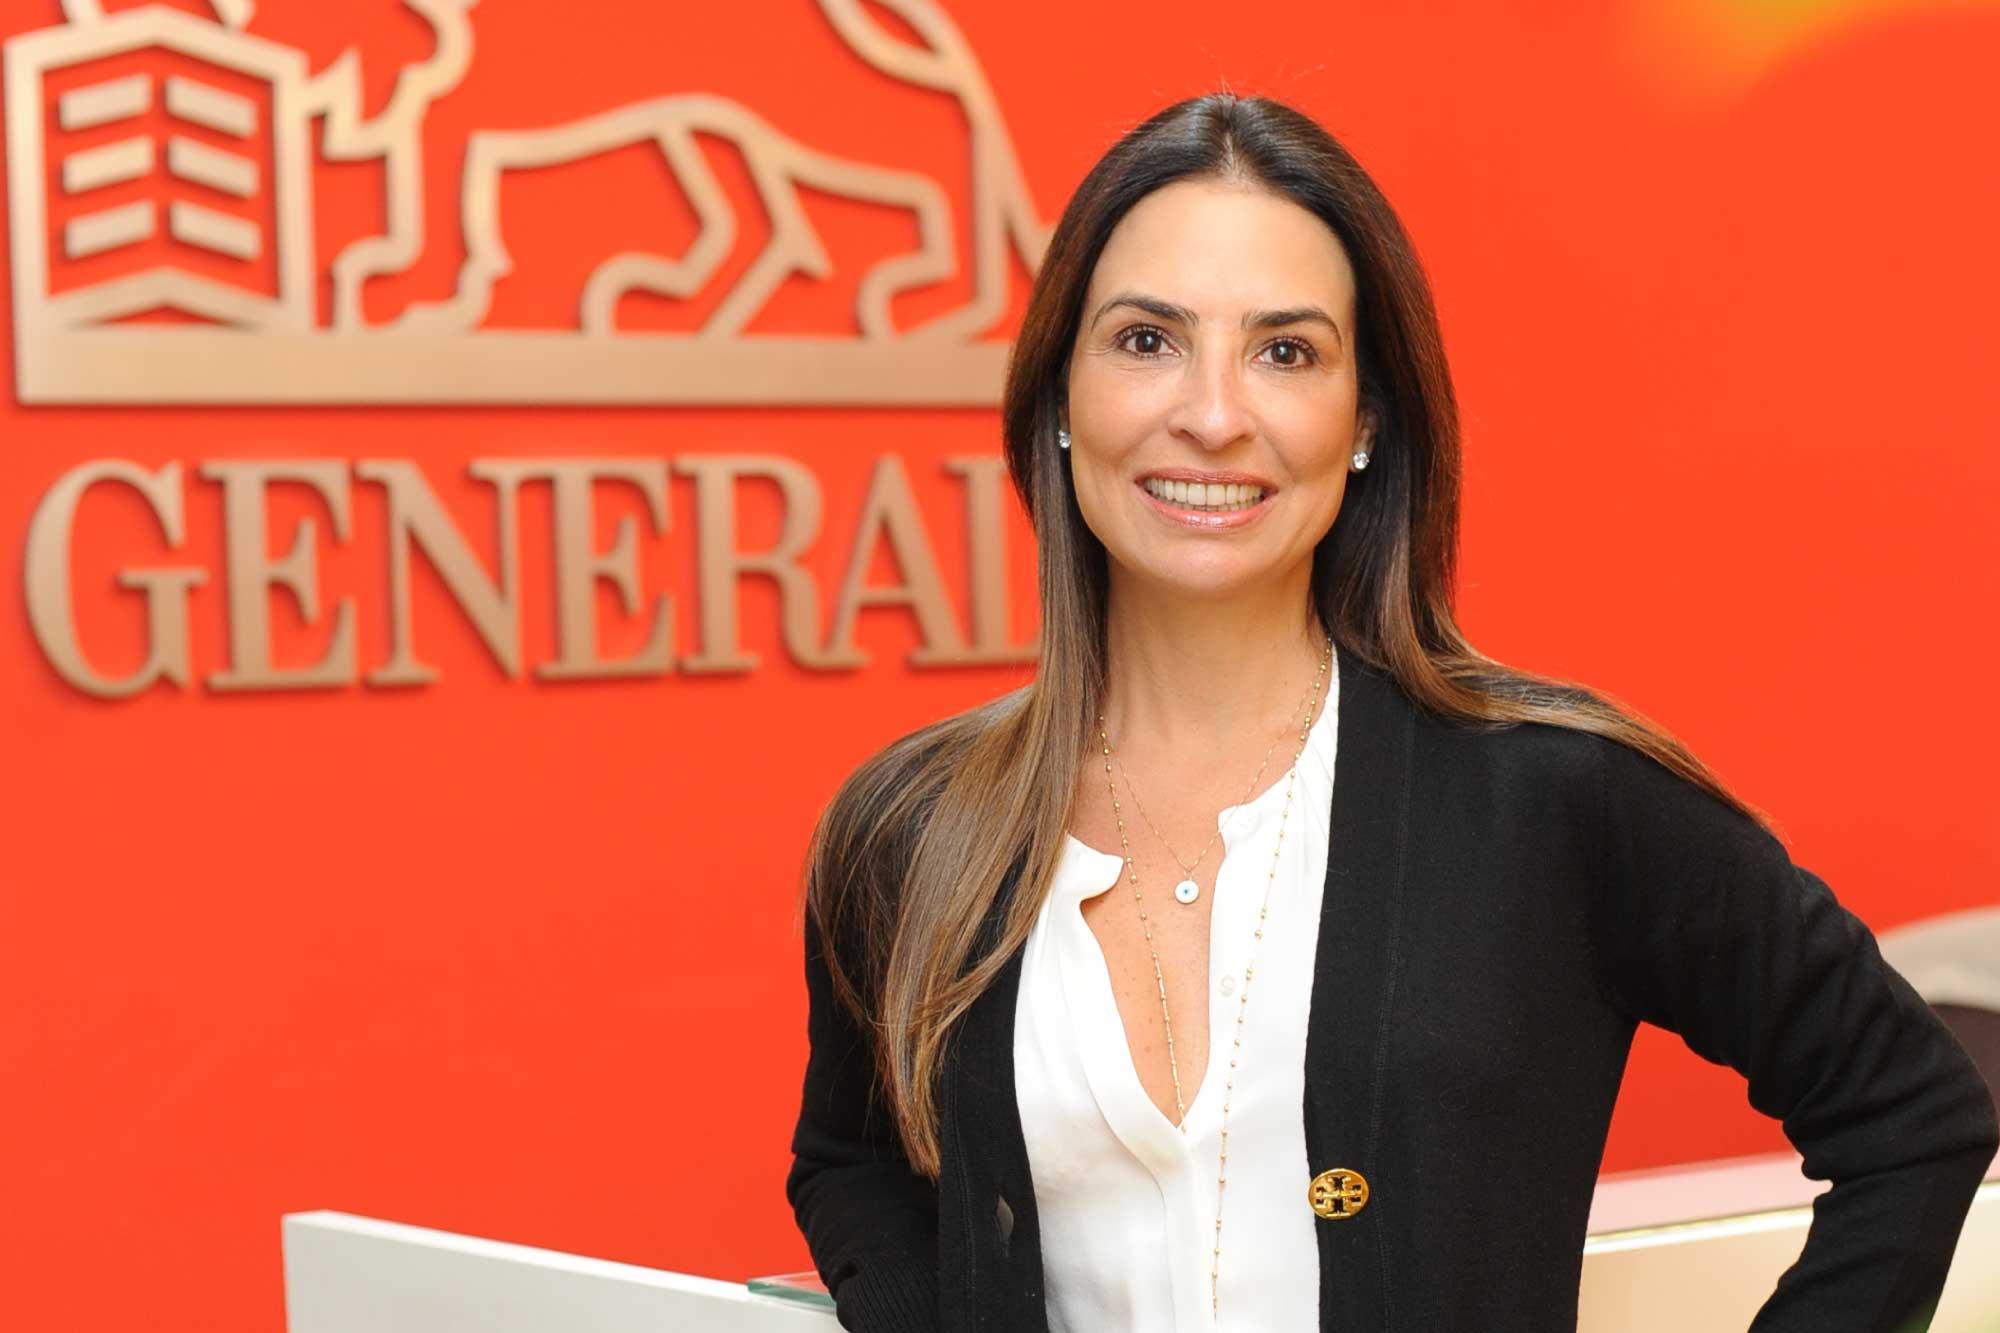 Generali fecha parceria exclusiva com Agibank por cinco anos